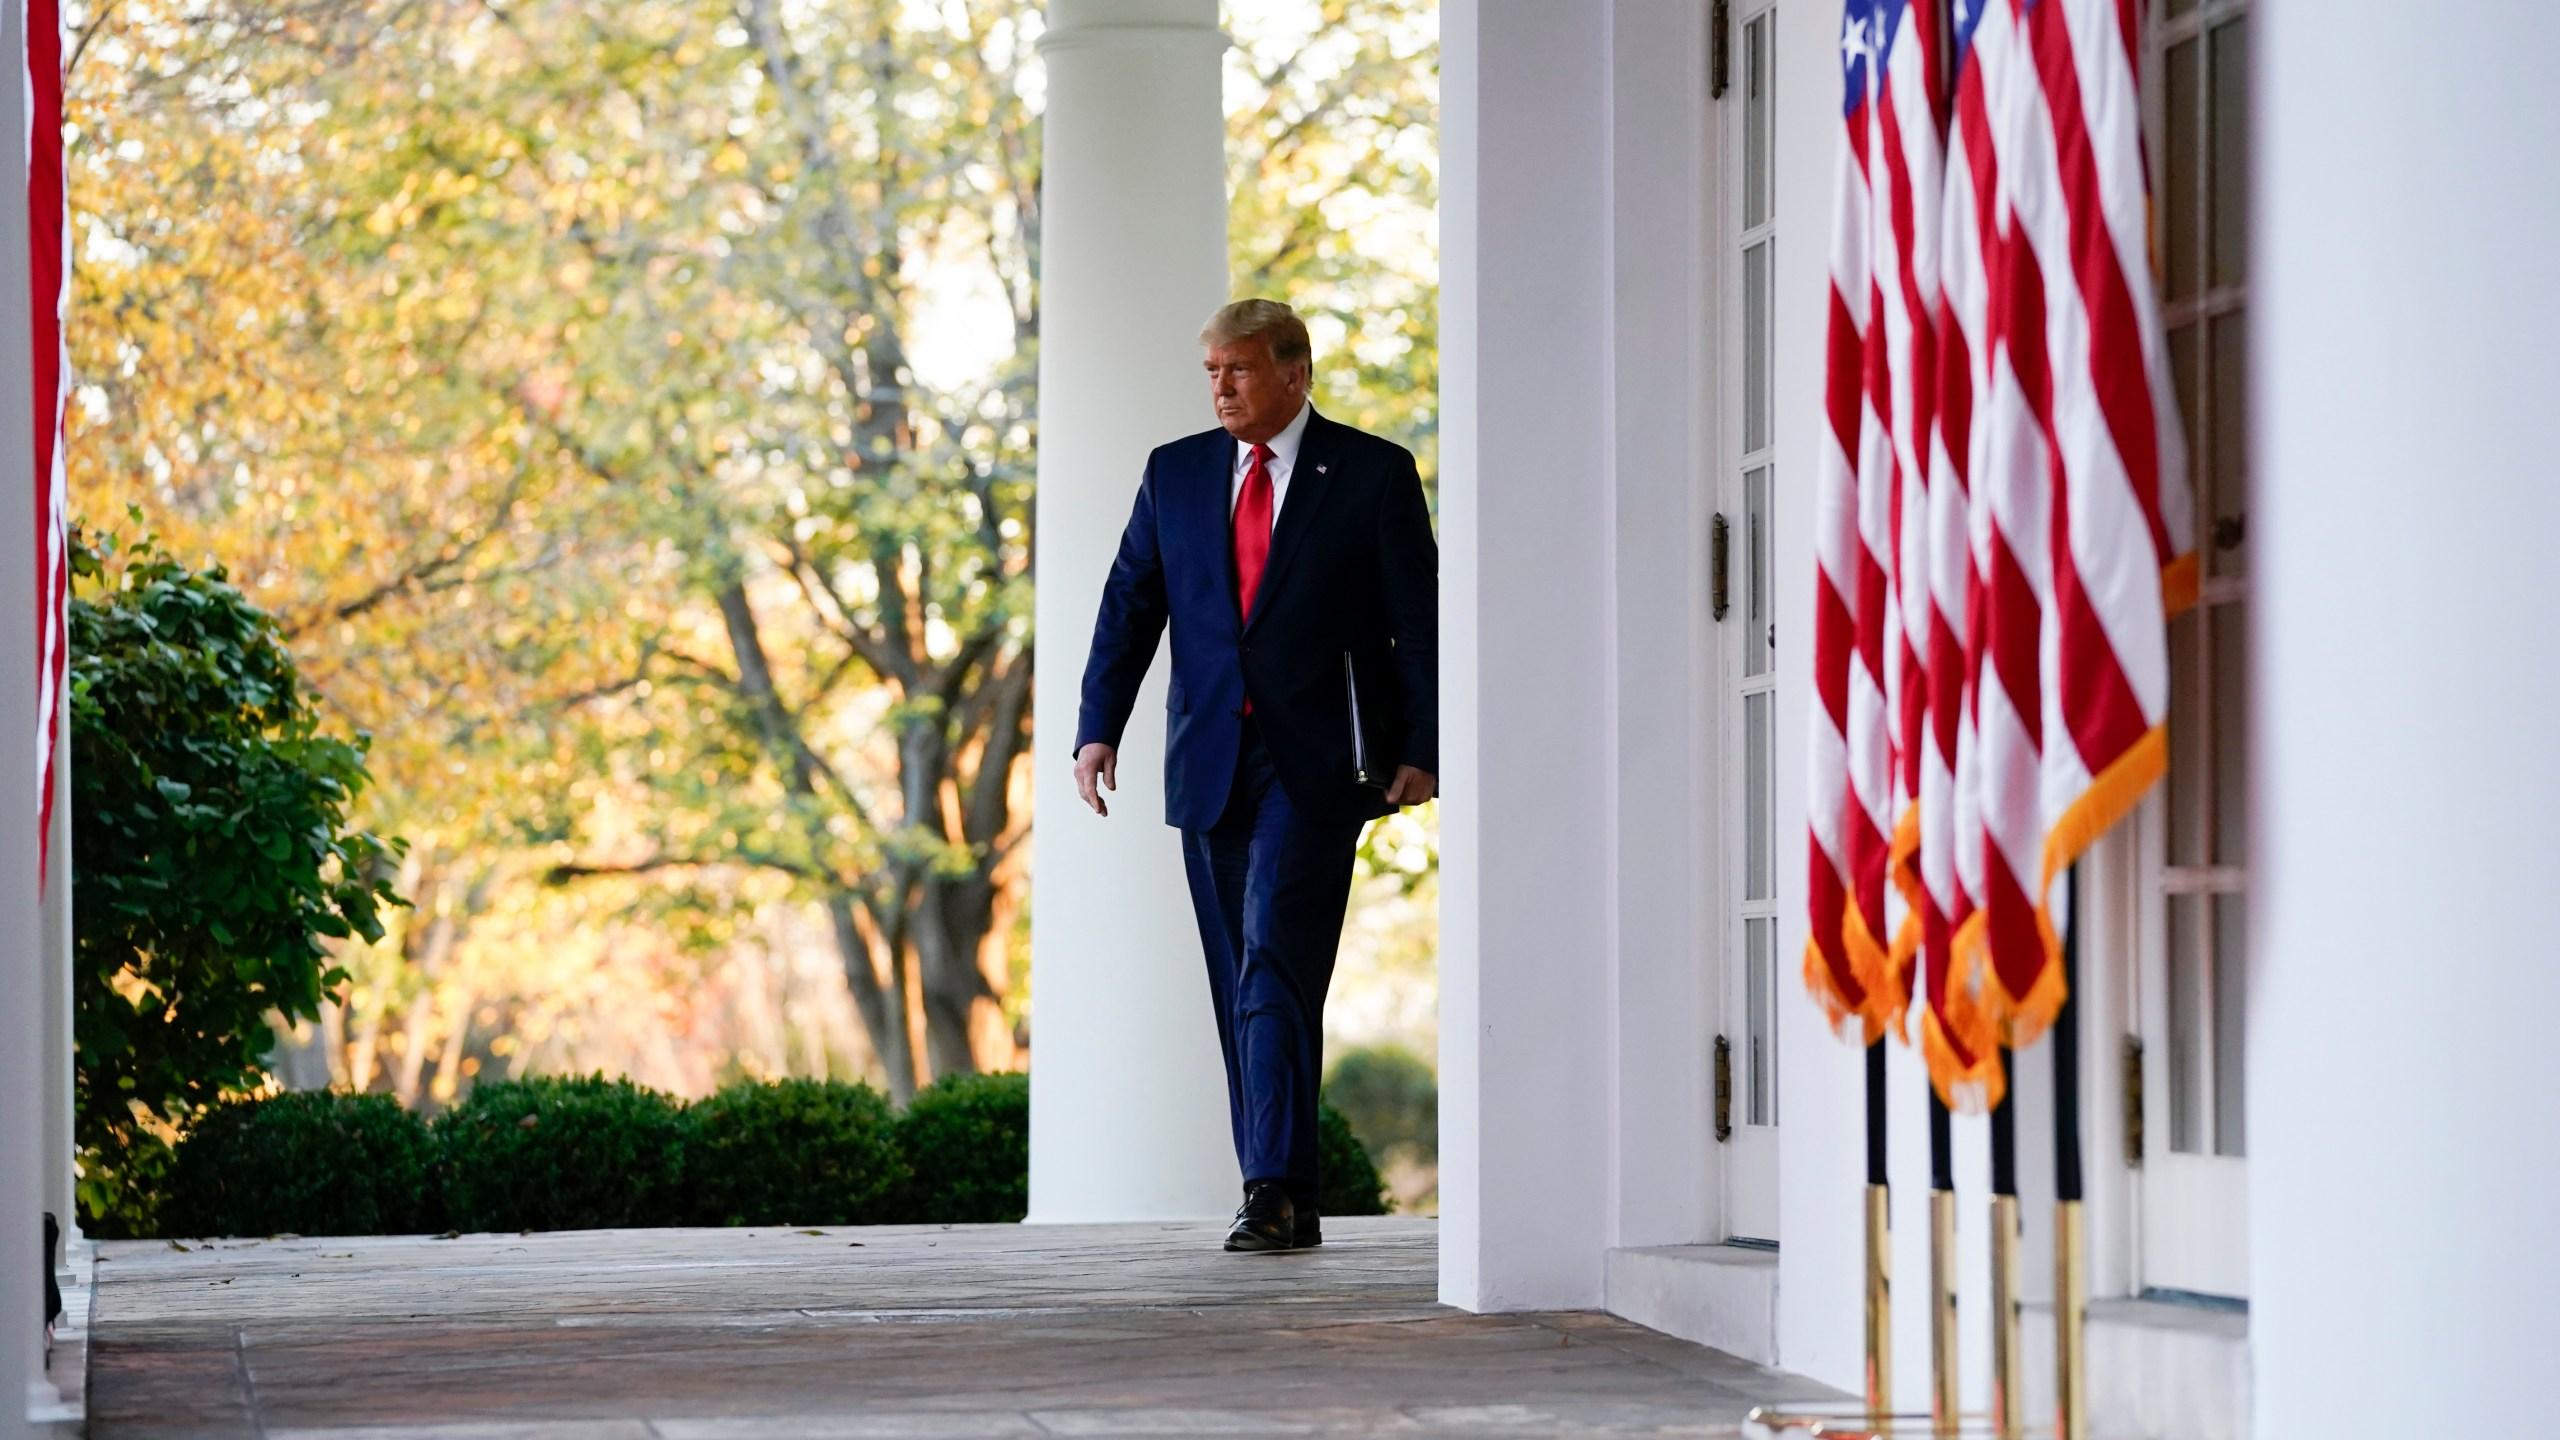 President Donald Trump arrives to speak in the Rose Garden of the White House on Nov. 13, 2020. (Evan Vucci/Associated Press)